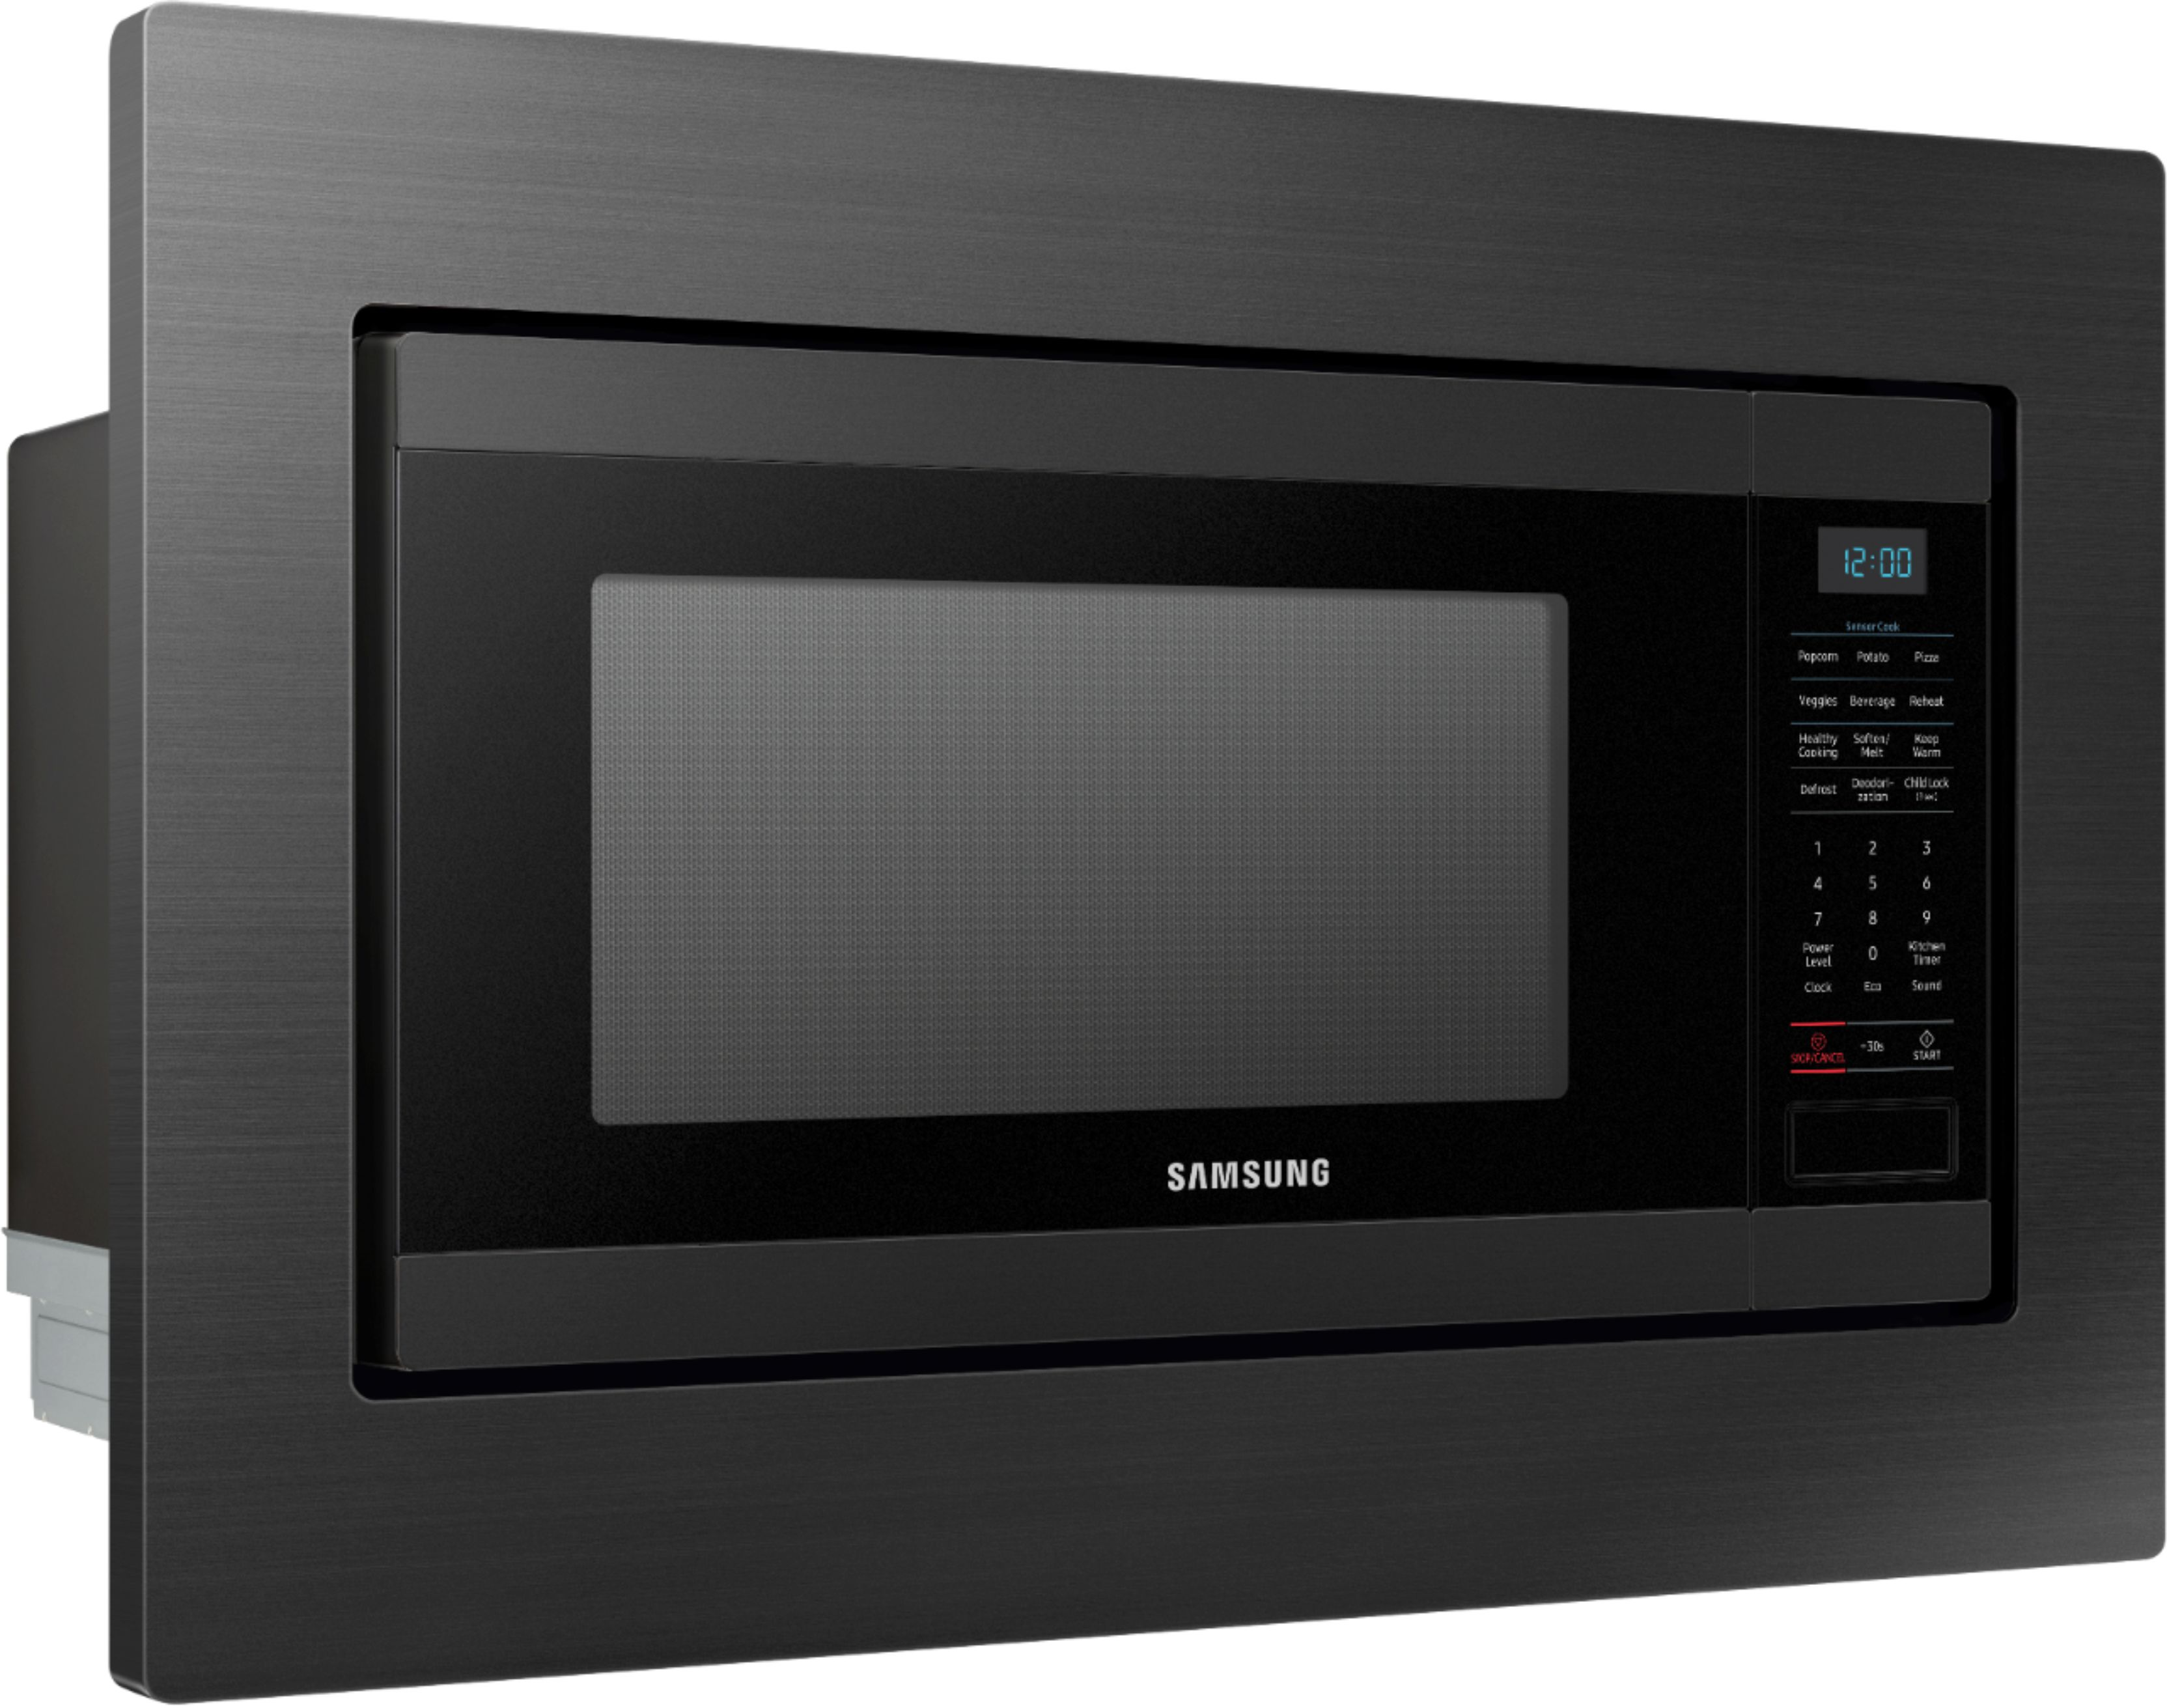 30 trim kit for samsung ms19m8020tg microwave fingerprint resistant black stainless steel